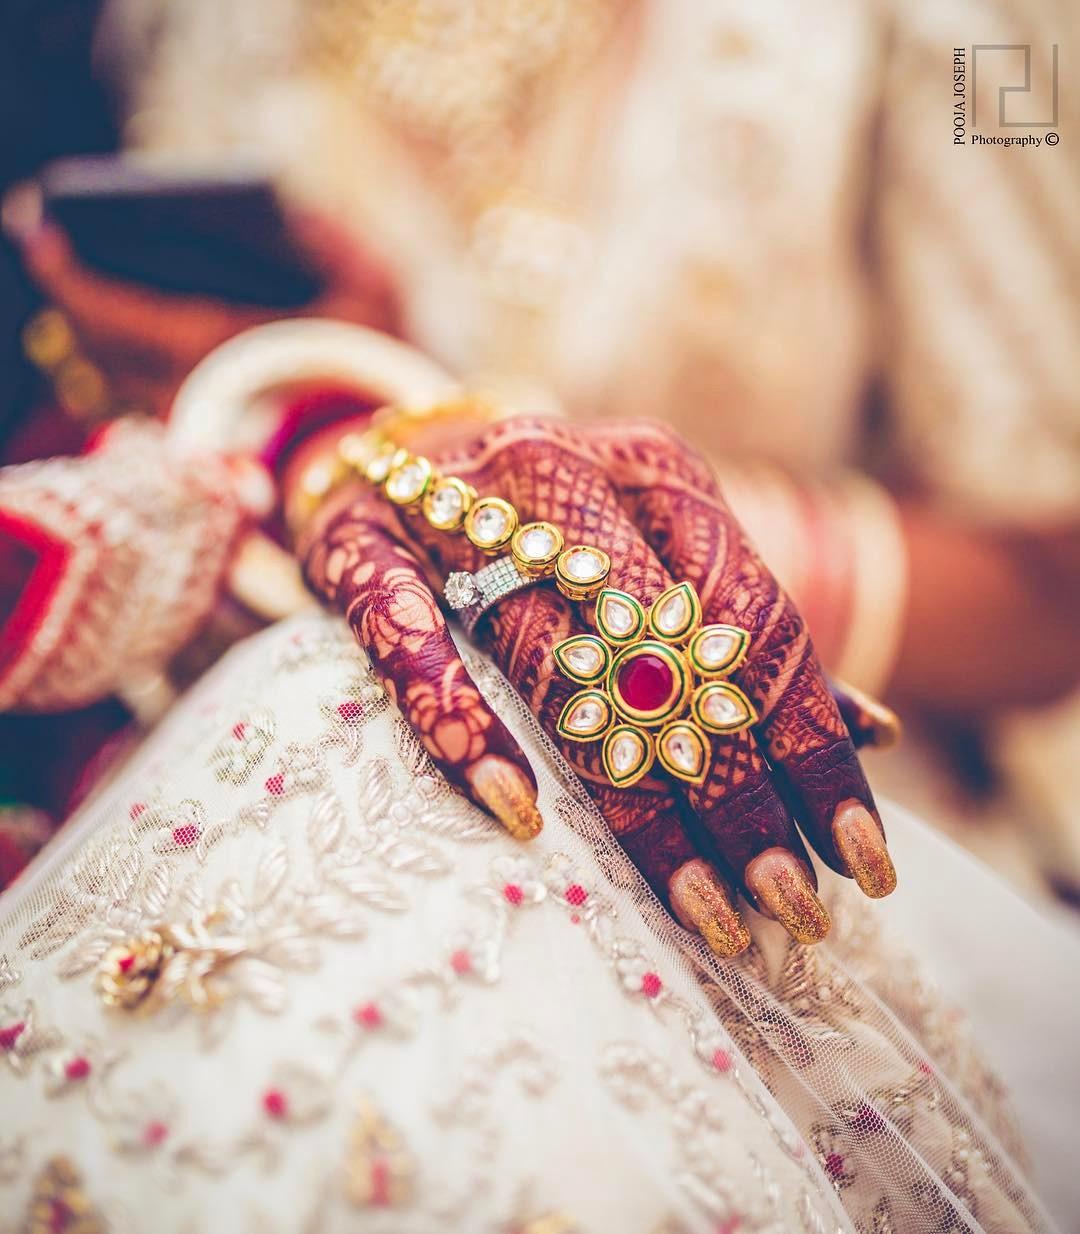 Kundan jewellery, hathphool, gold jewellery, kundan hathphool, kundan haathphool, bride hands, bride, mehendi hands, henna hands, wedding inspirations, hathphool ideas, wedding ring, wedding jewellery, bridal jewellery, wedding photography